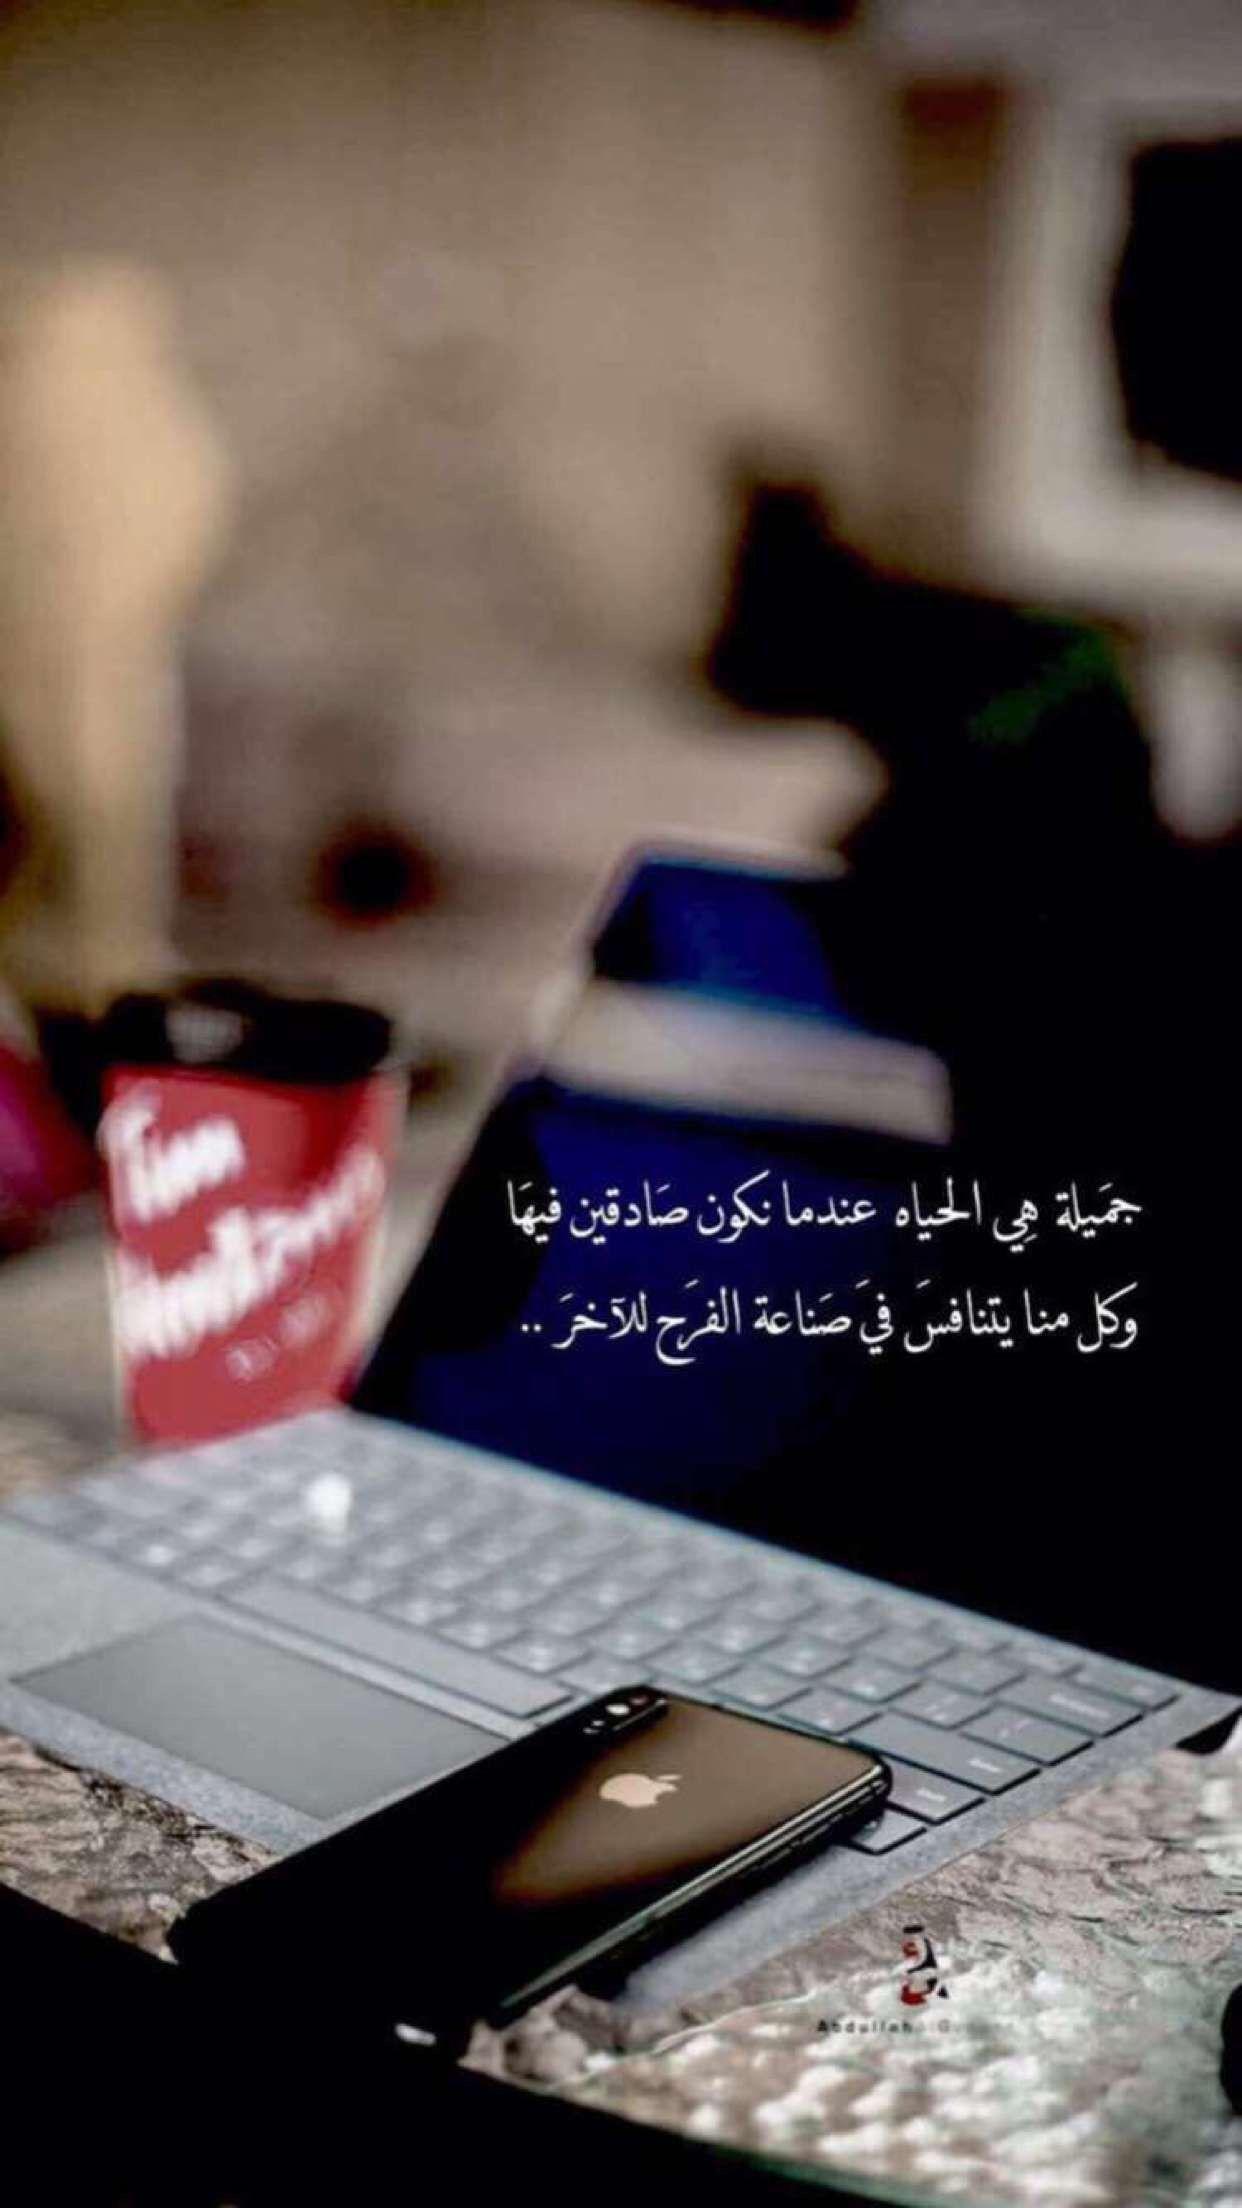 الصورة حلوة Wallpaper Iphone Quotes Photo Quotes Arabic Quotes